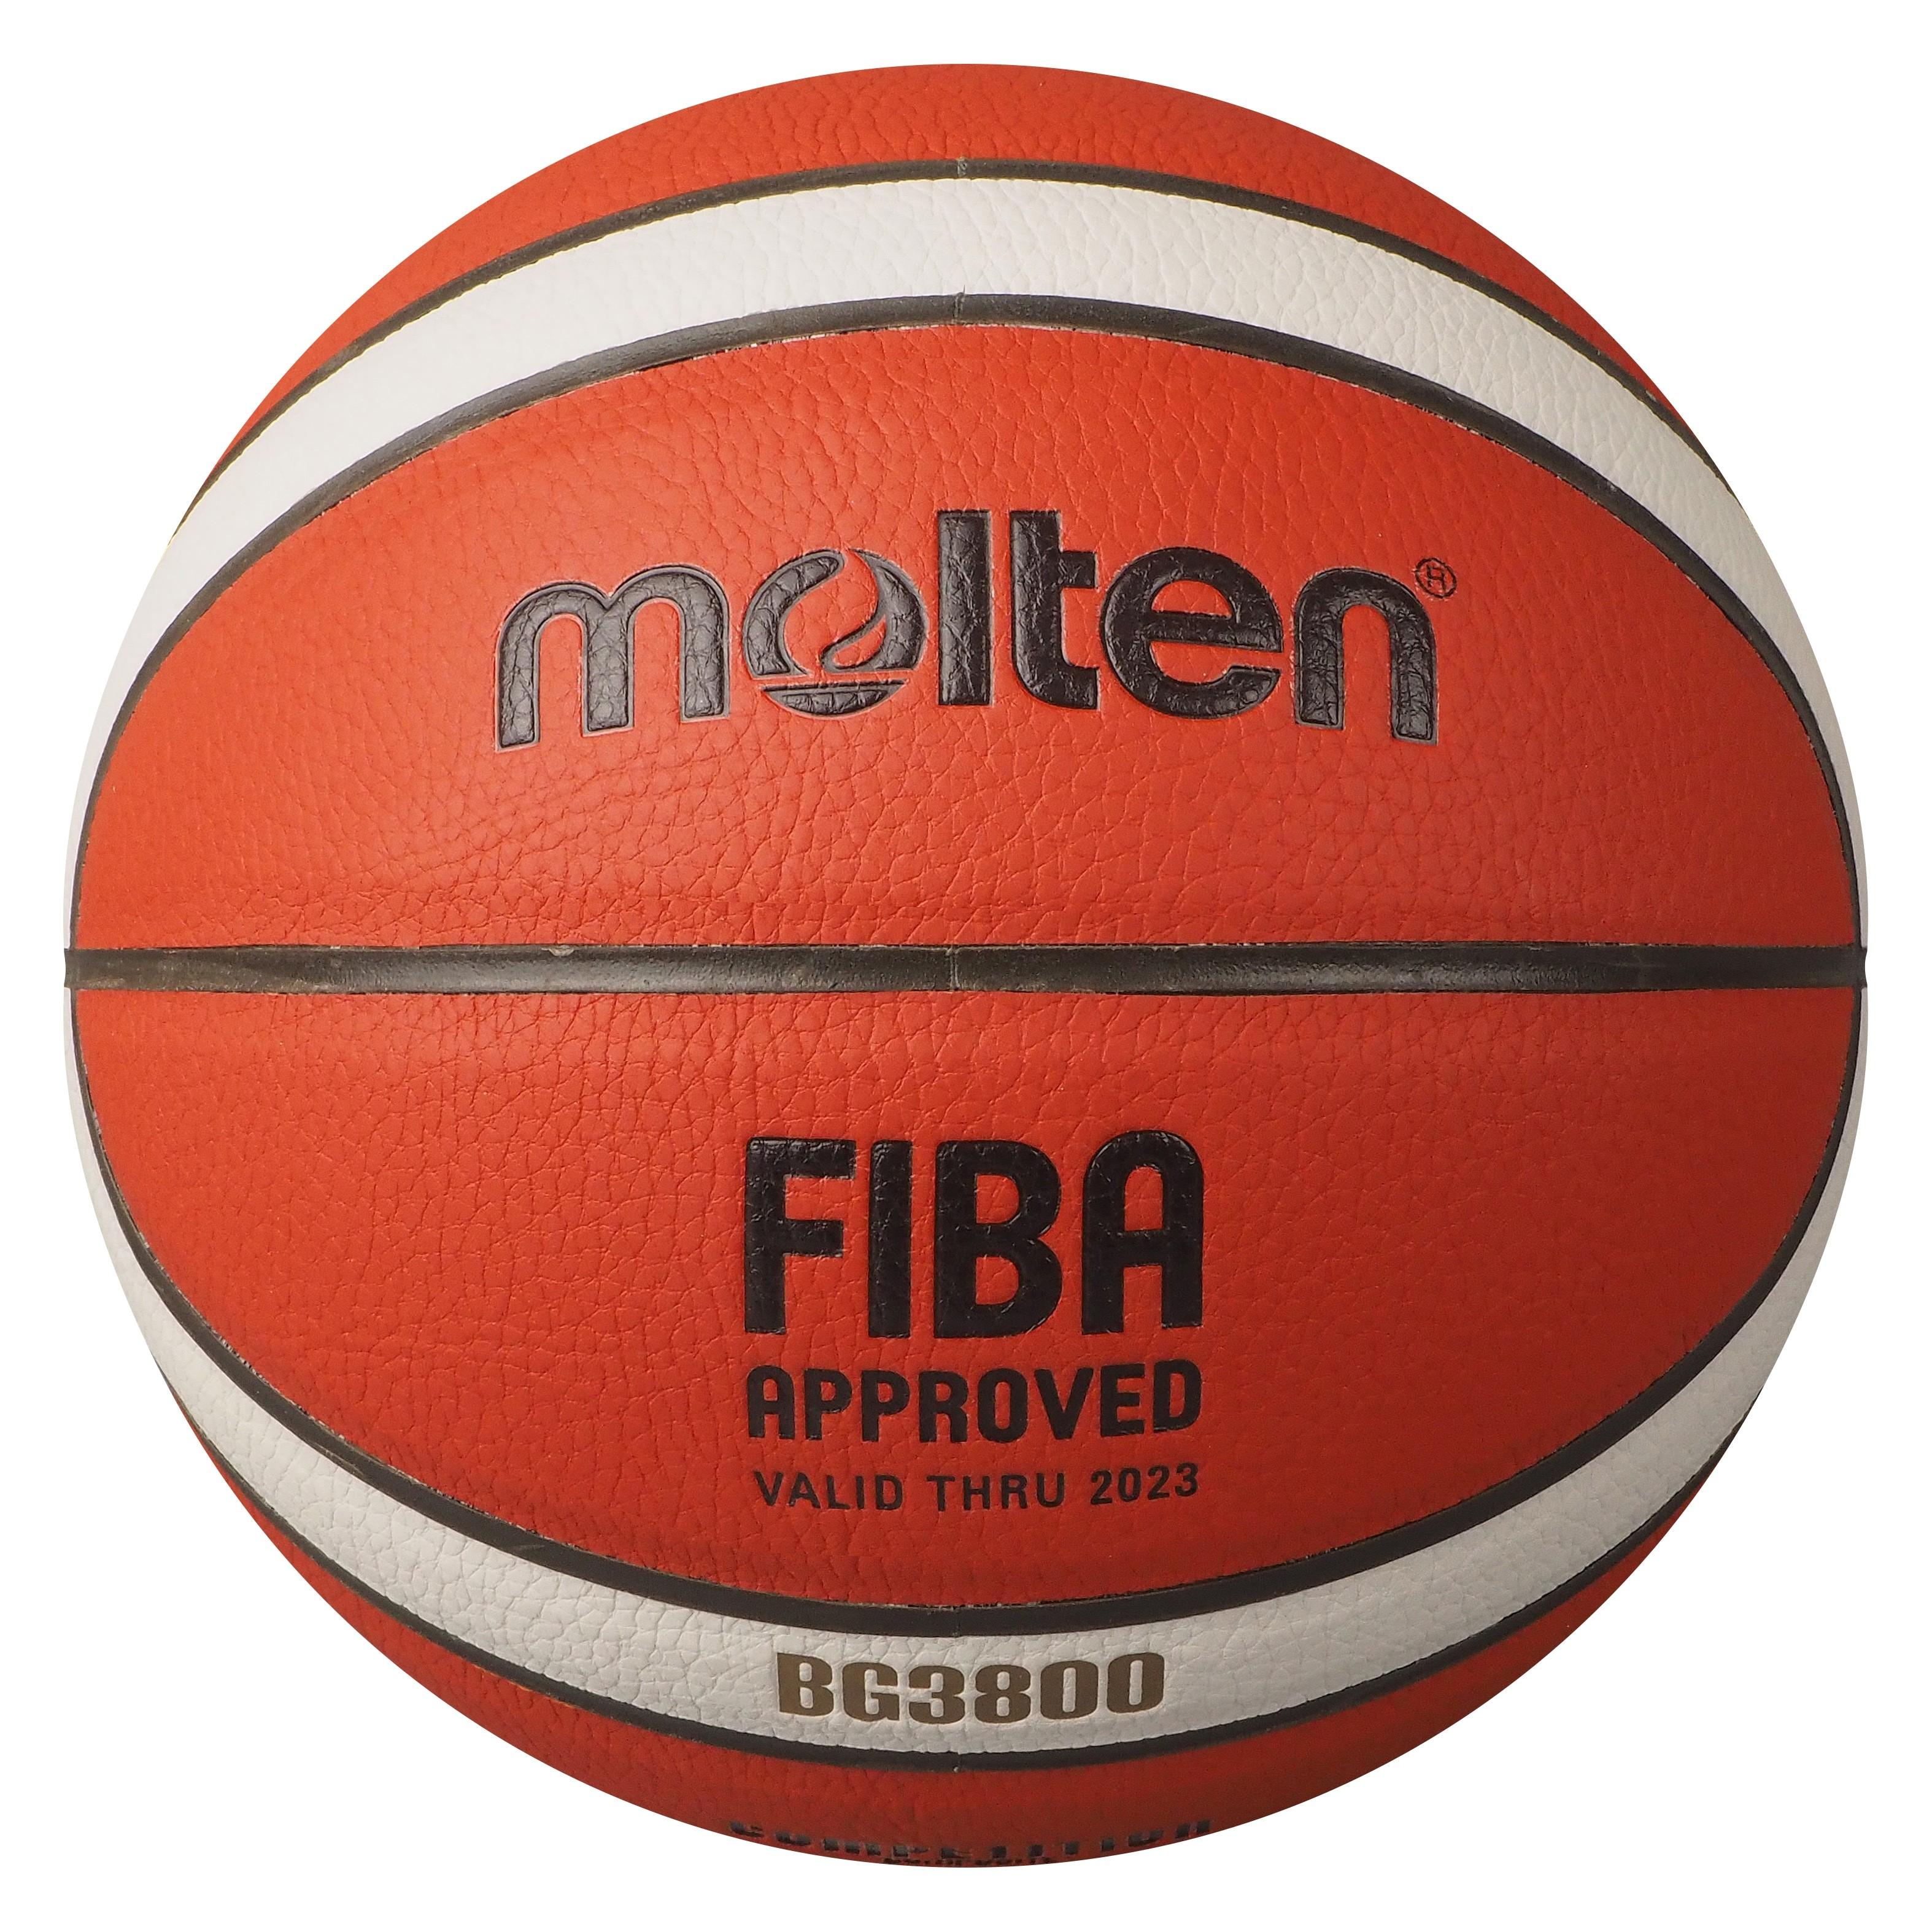 Molten BG3800 Basketball B7G3800 B6G3800 B5G3800 Main Front Image